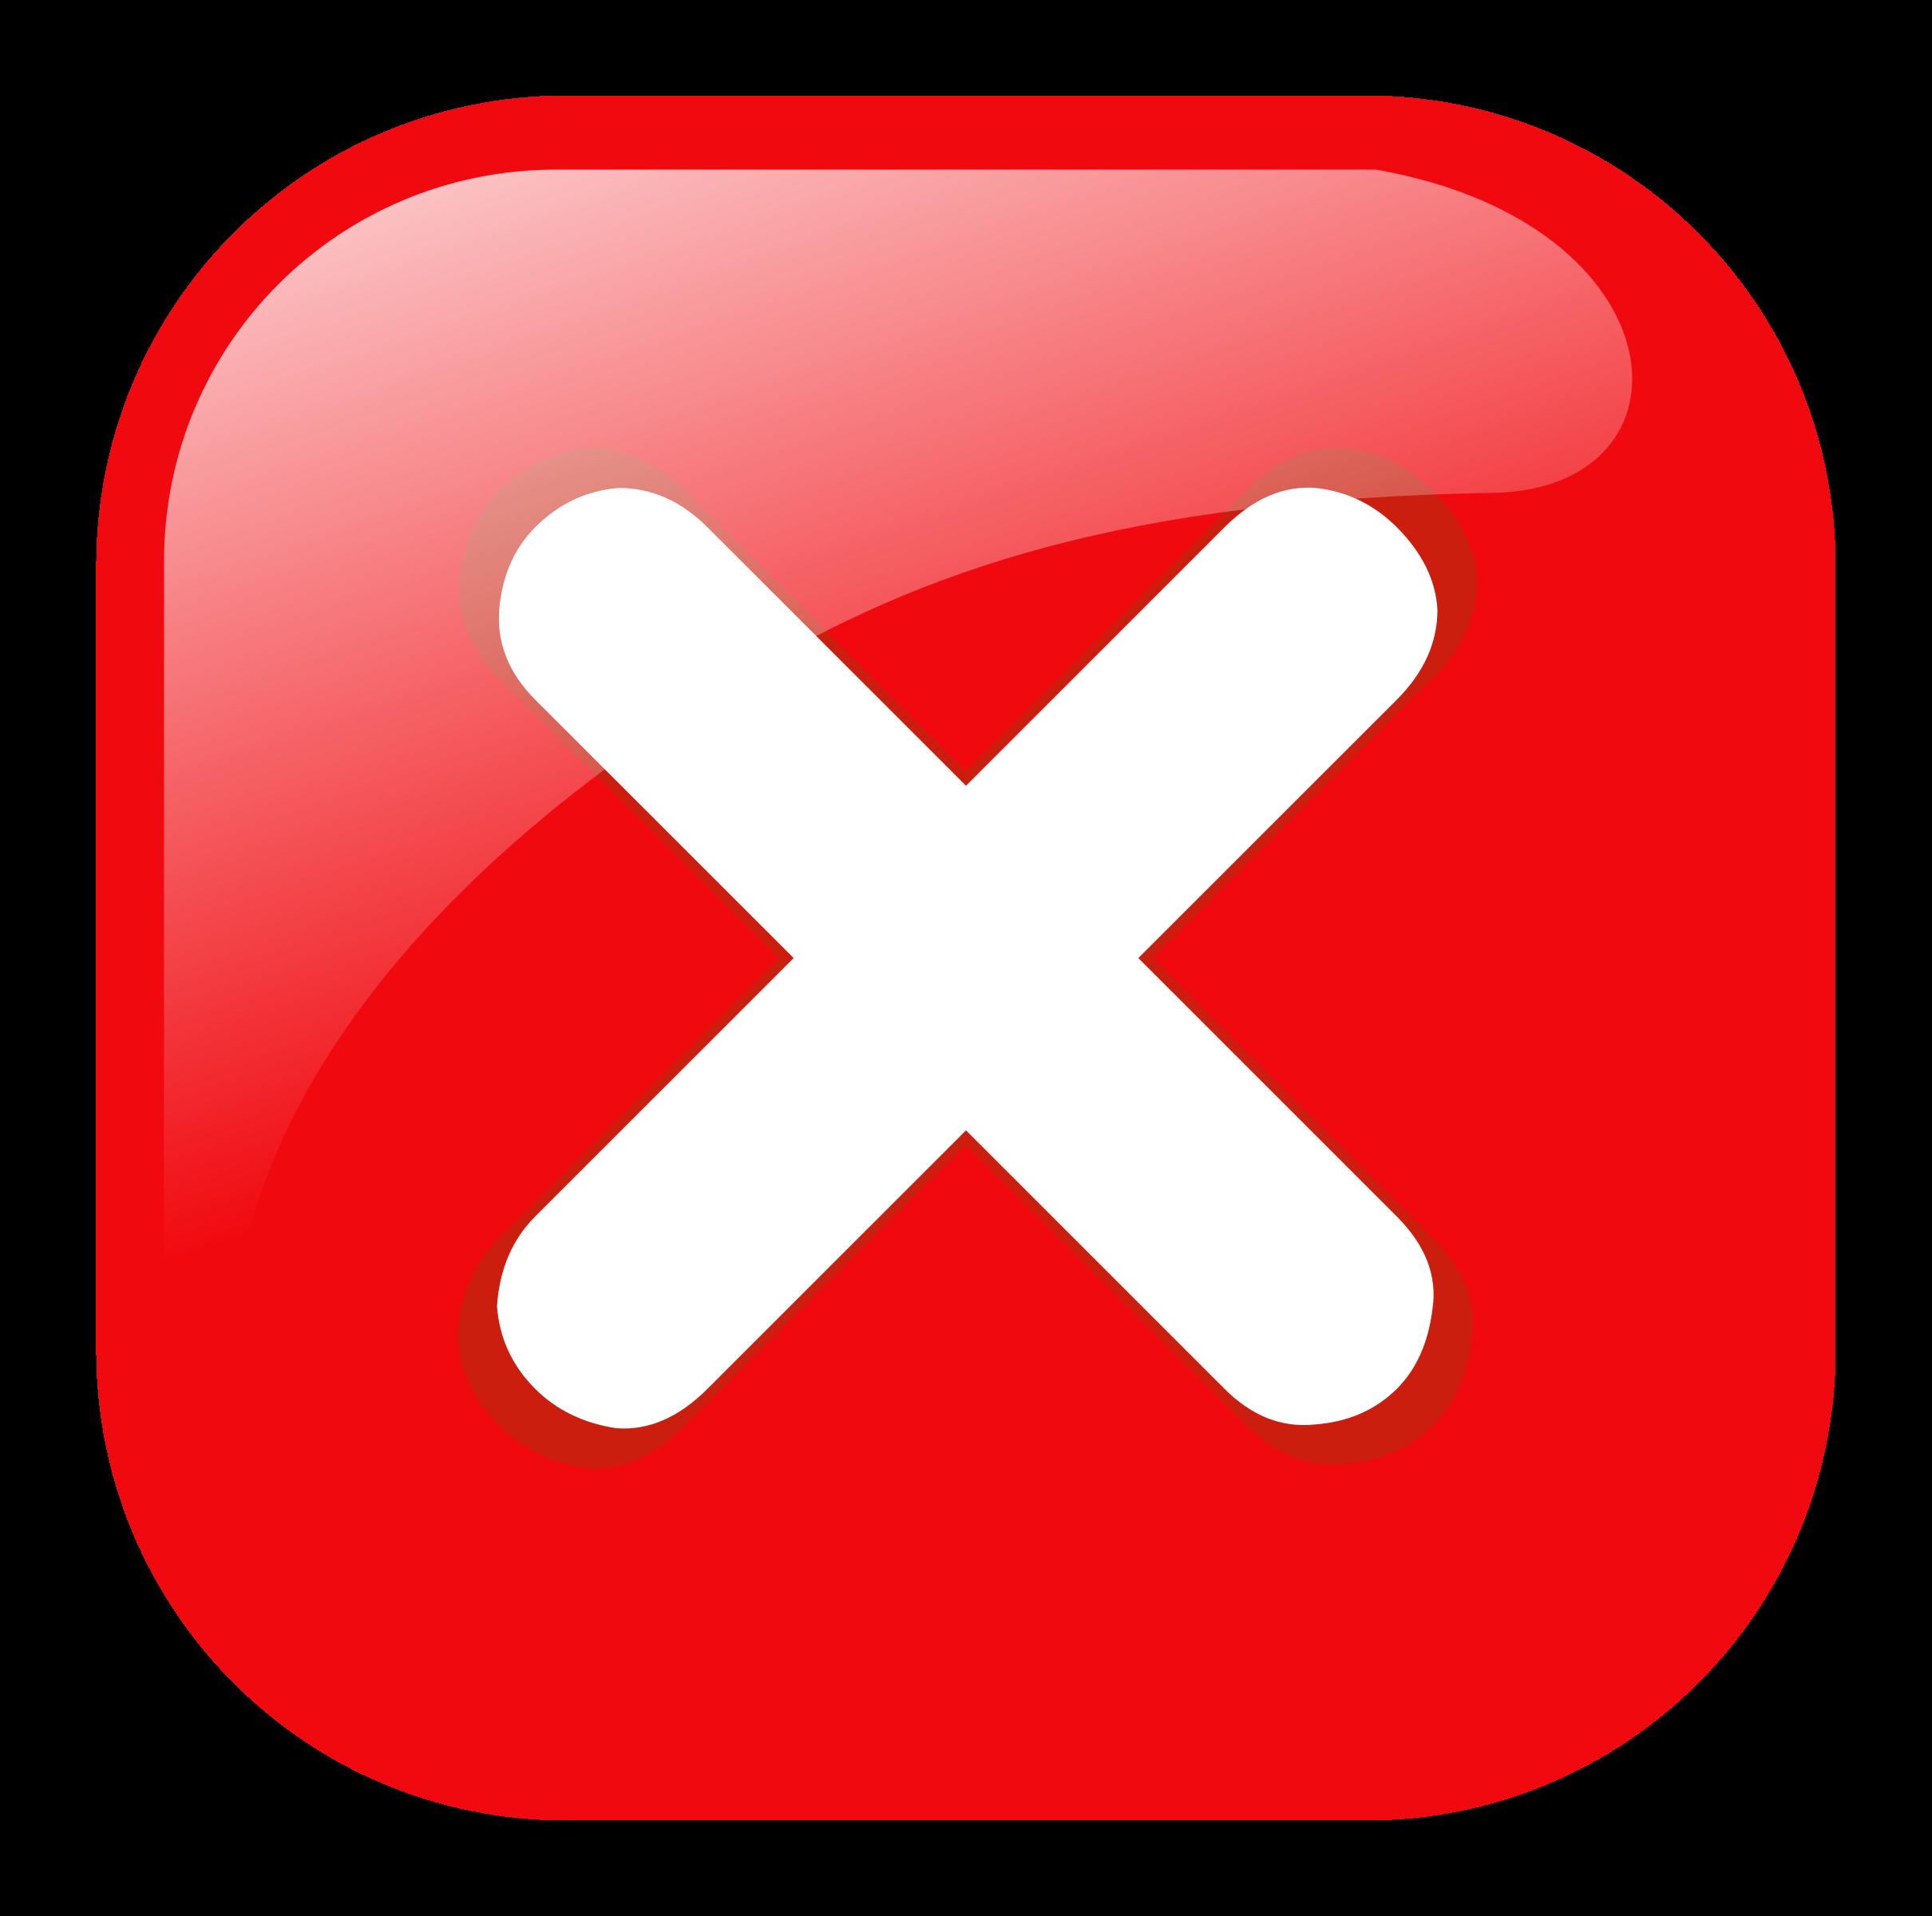 Error warning icon big. Square clipart red color